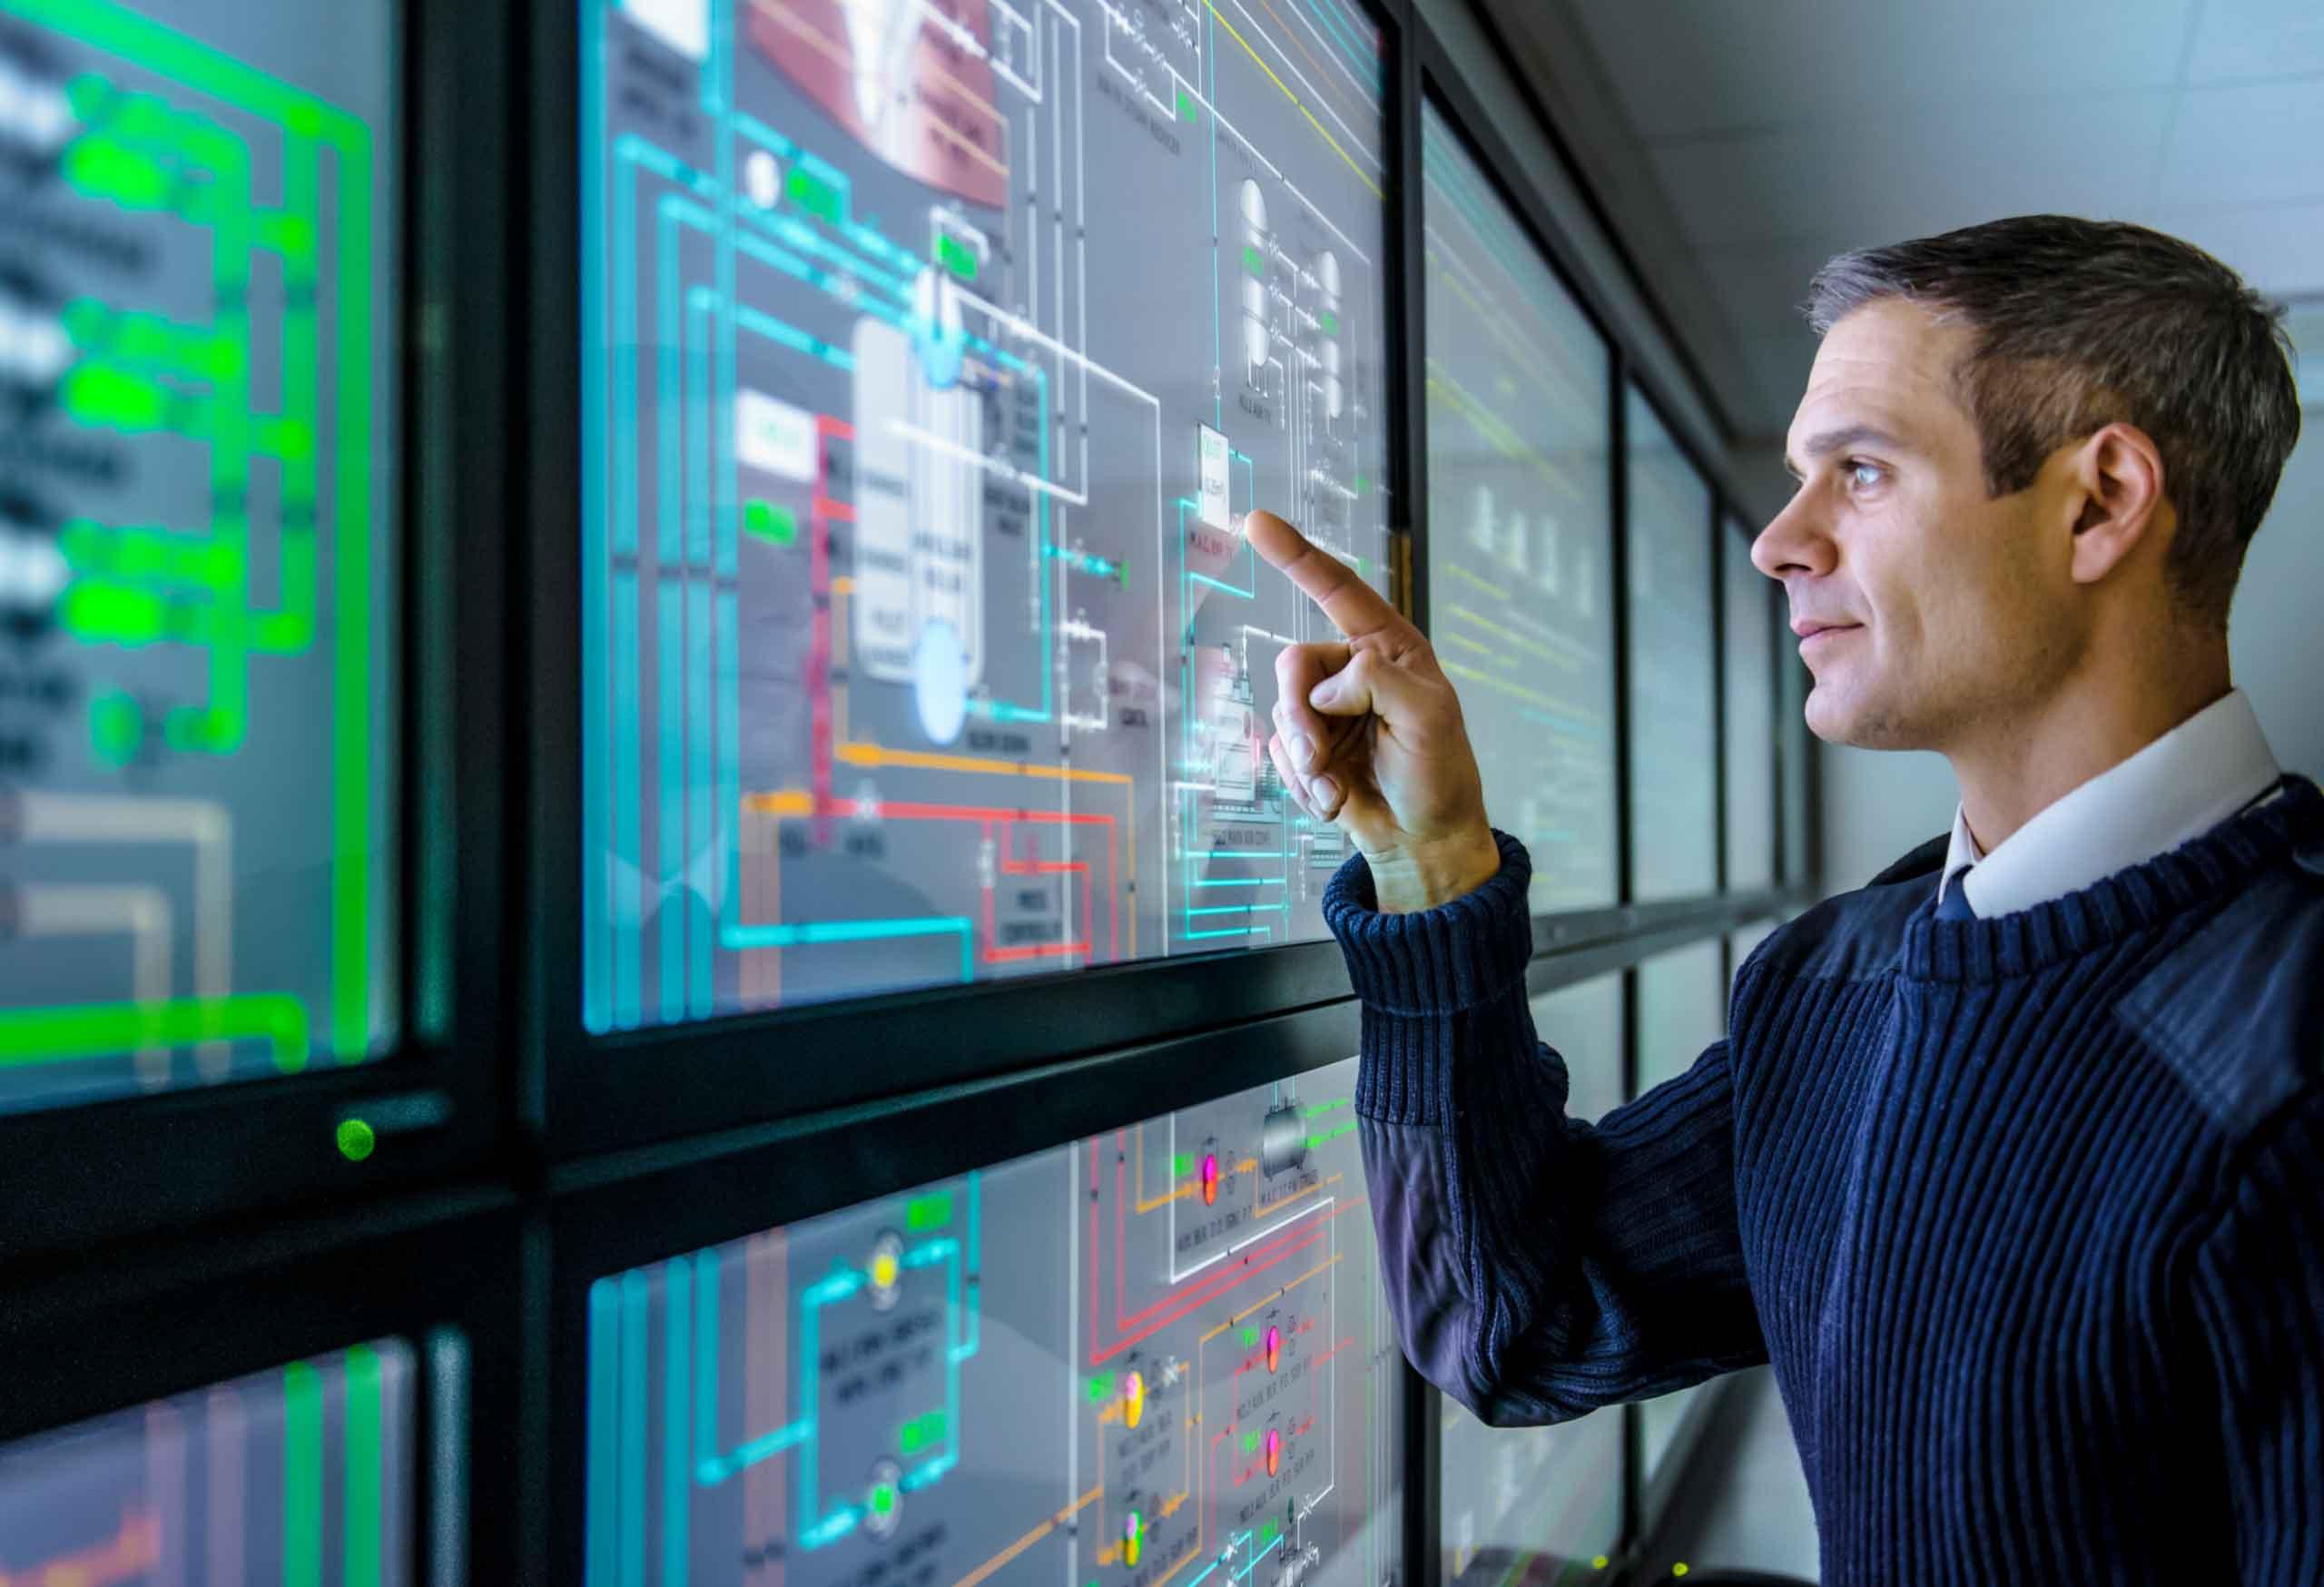 information technology professionals capi - HD1200×819